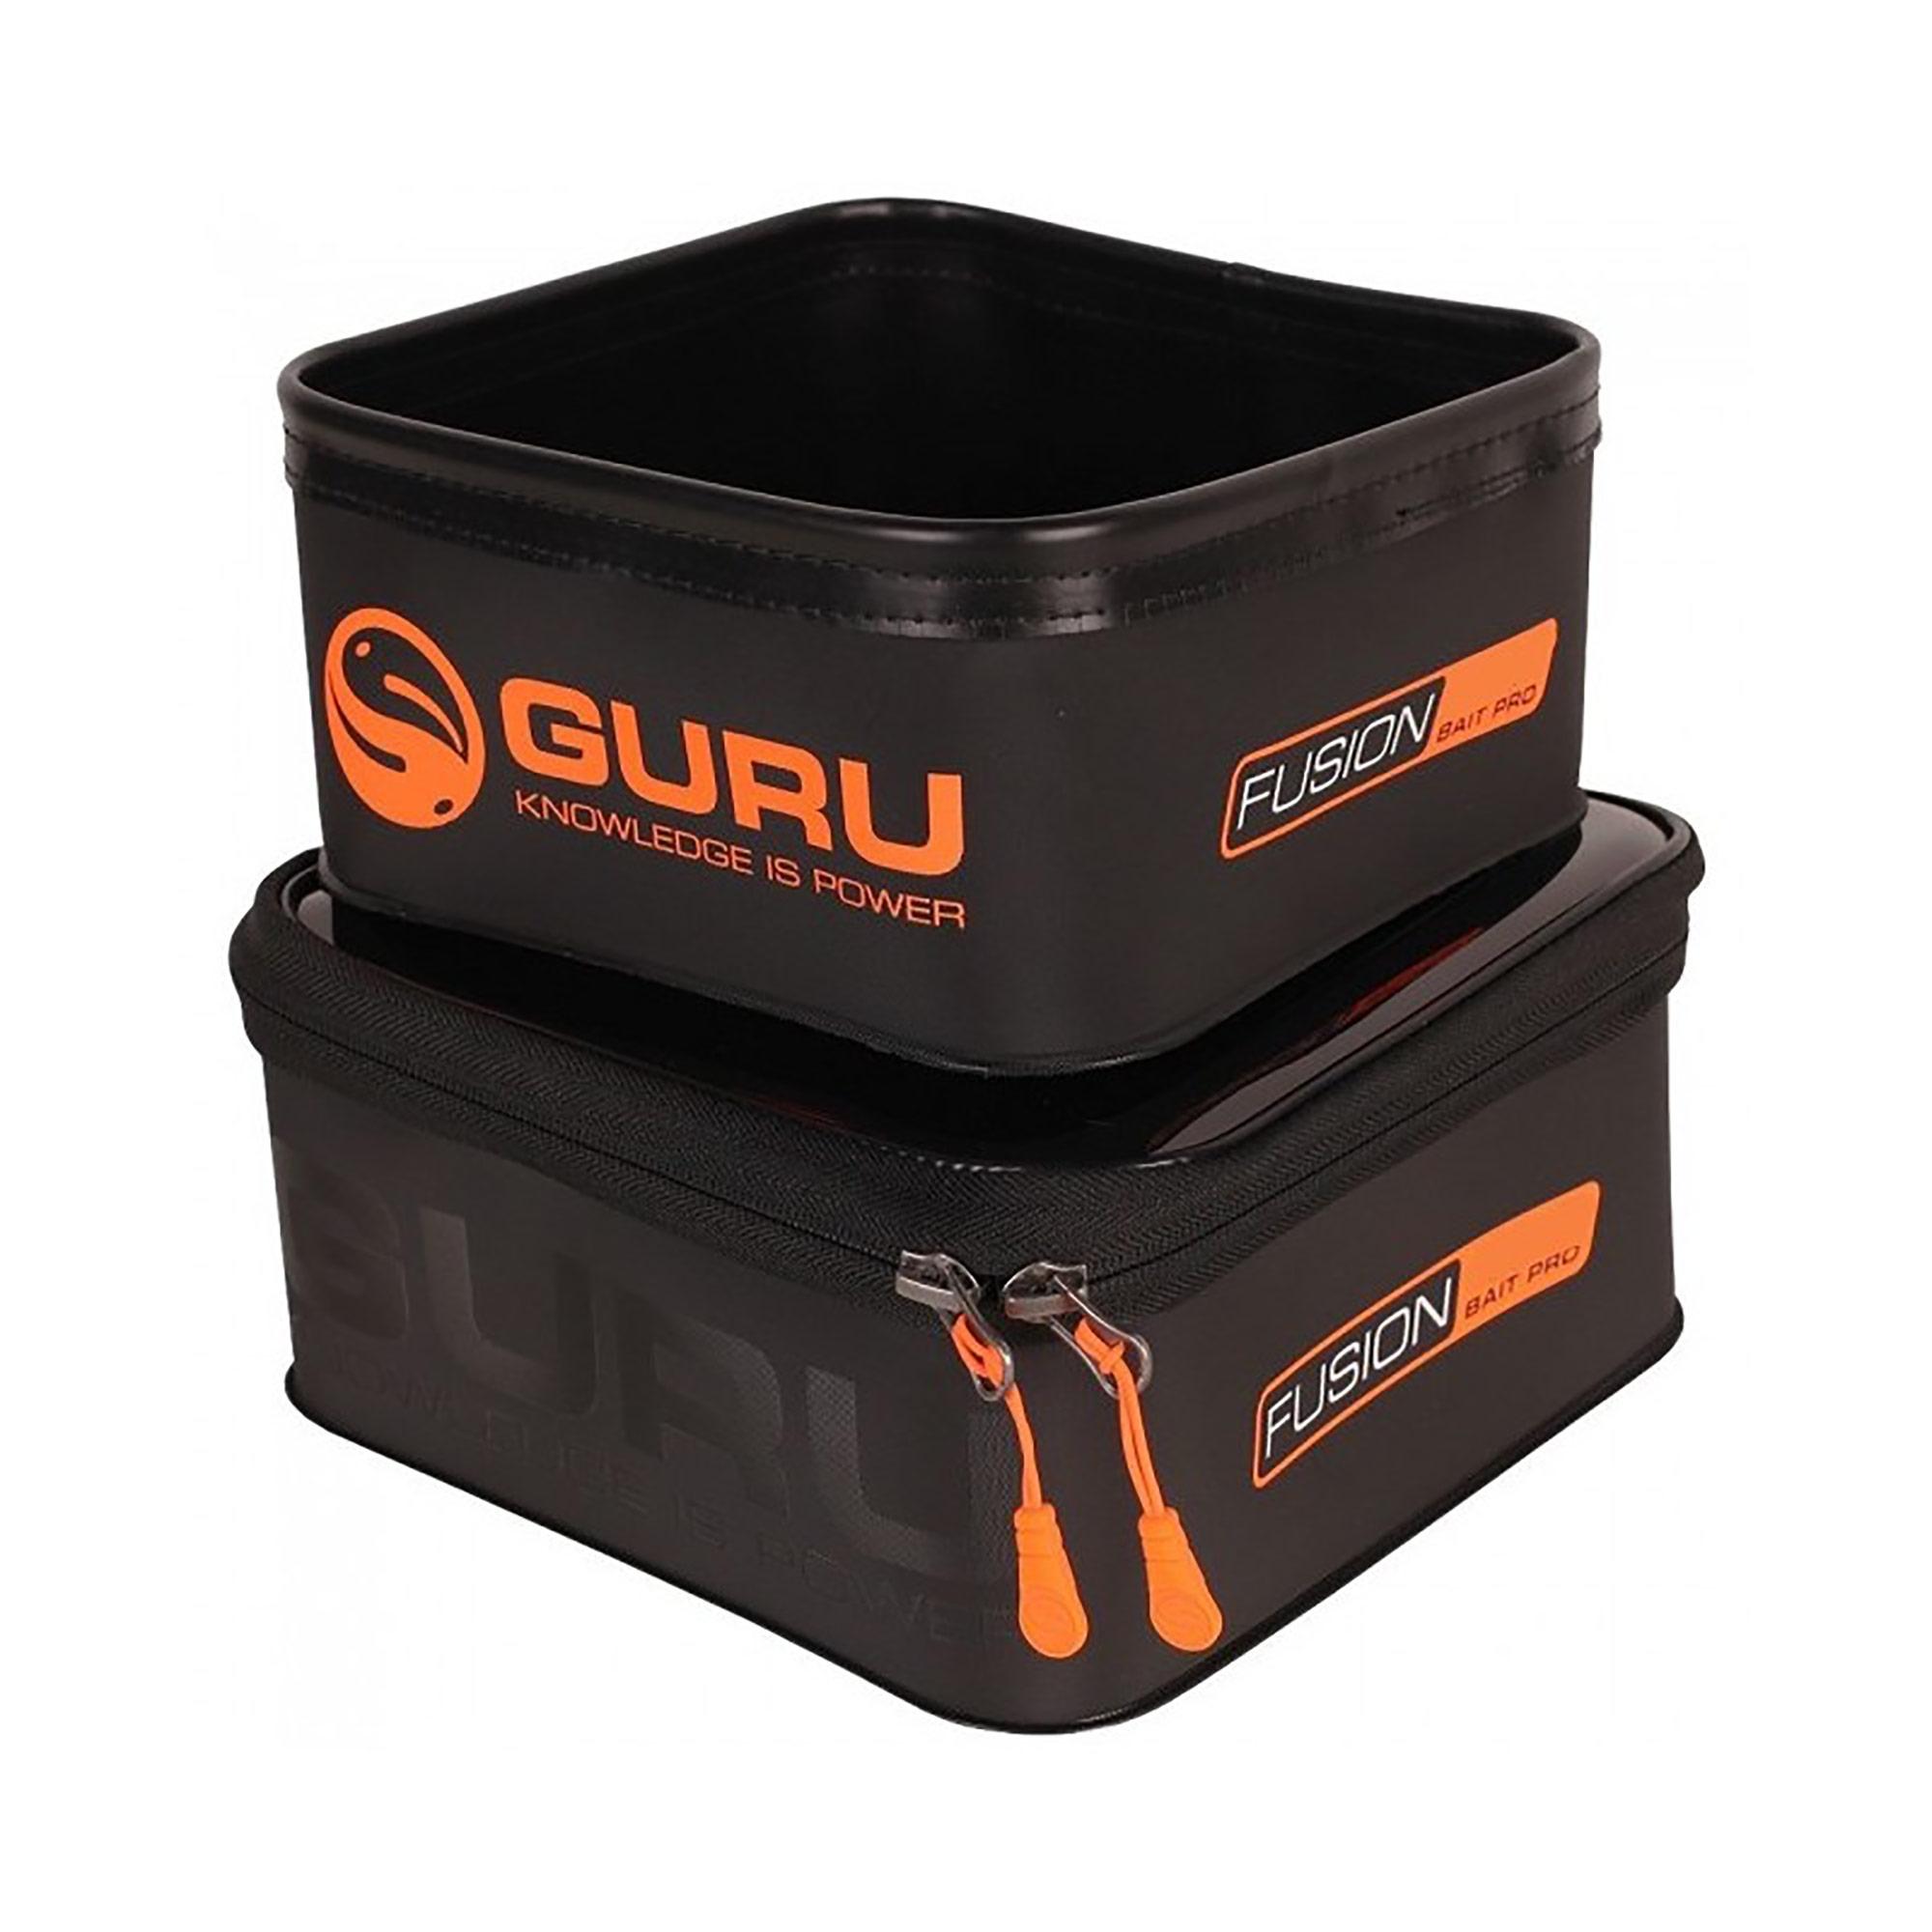 Astuccio Fusion 600 + Bait pro 500 (combo) GURU